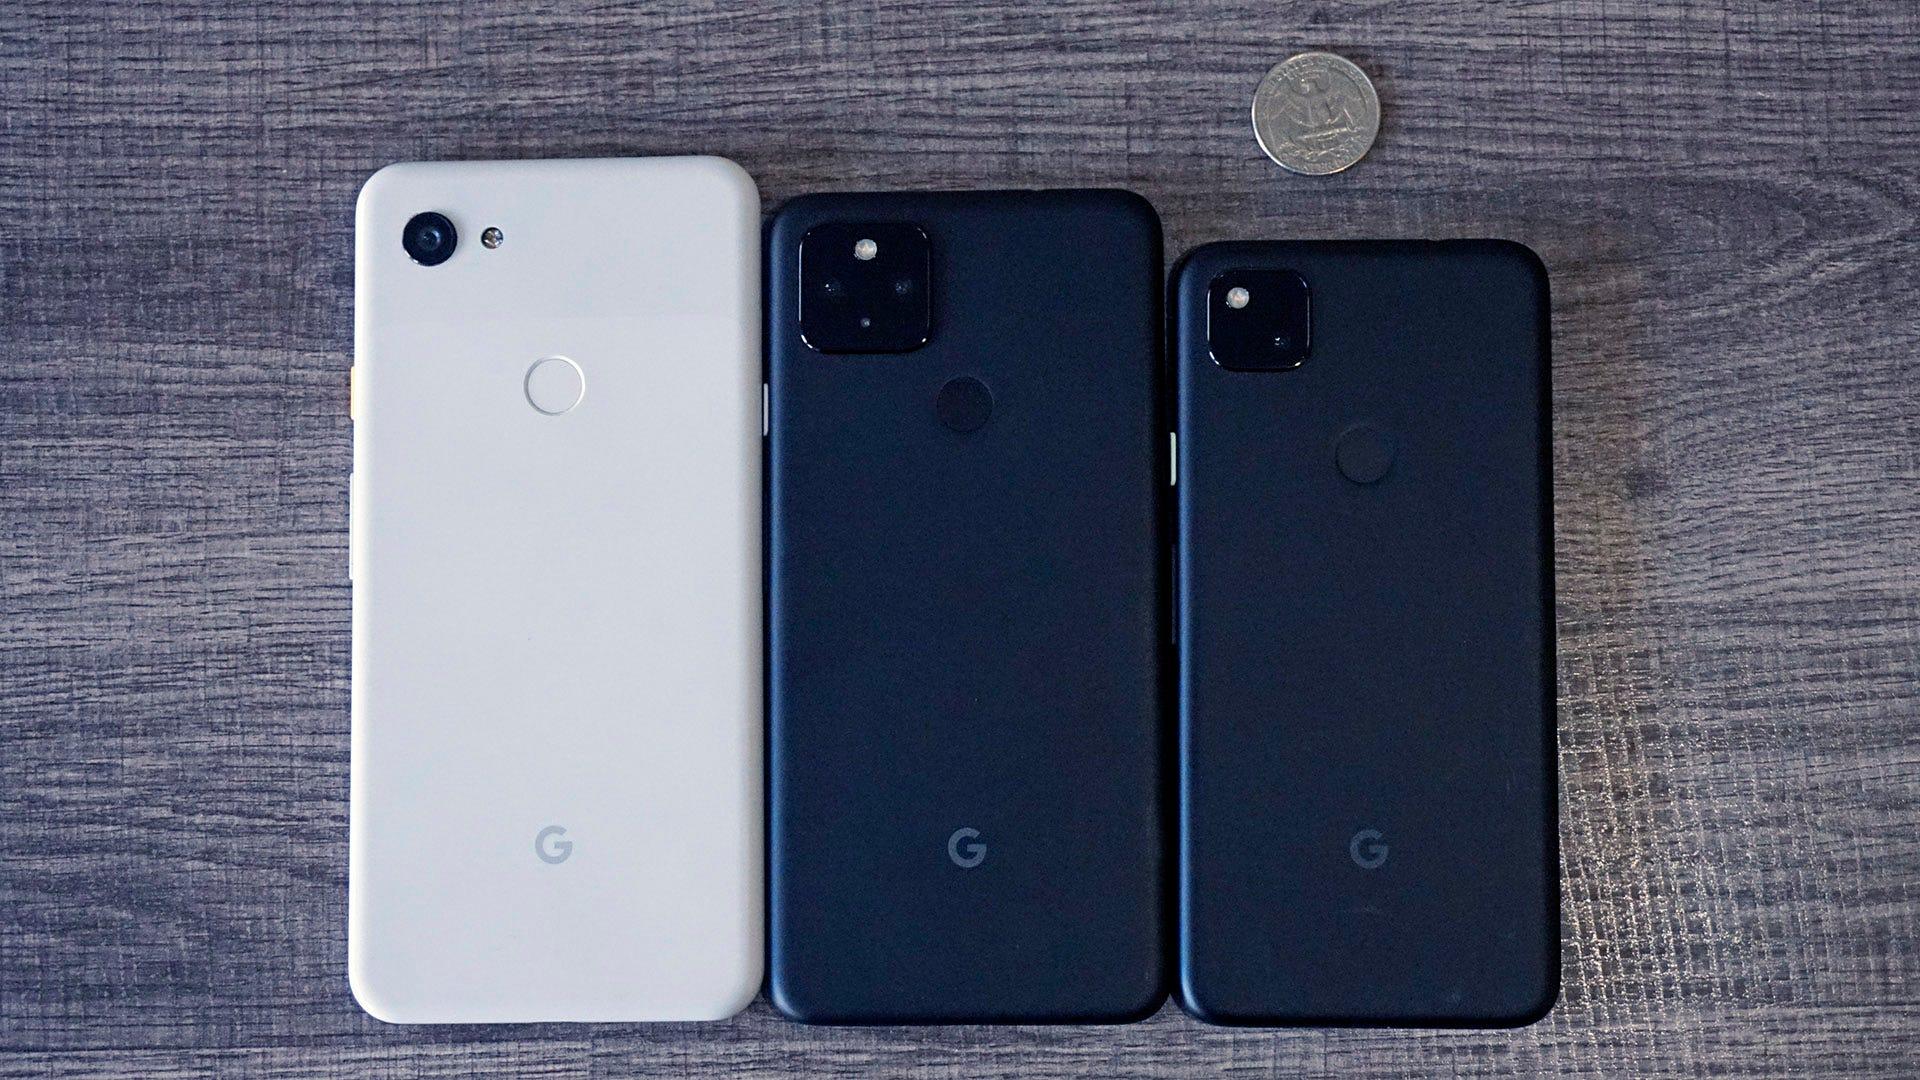 Left to right: Pixel 3a XL, Pixel 4a 5G, Pixel 4a.